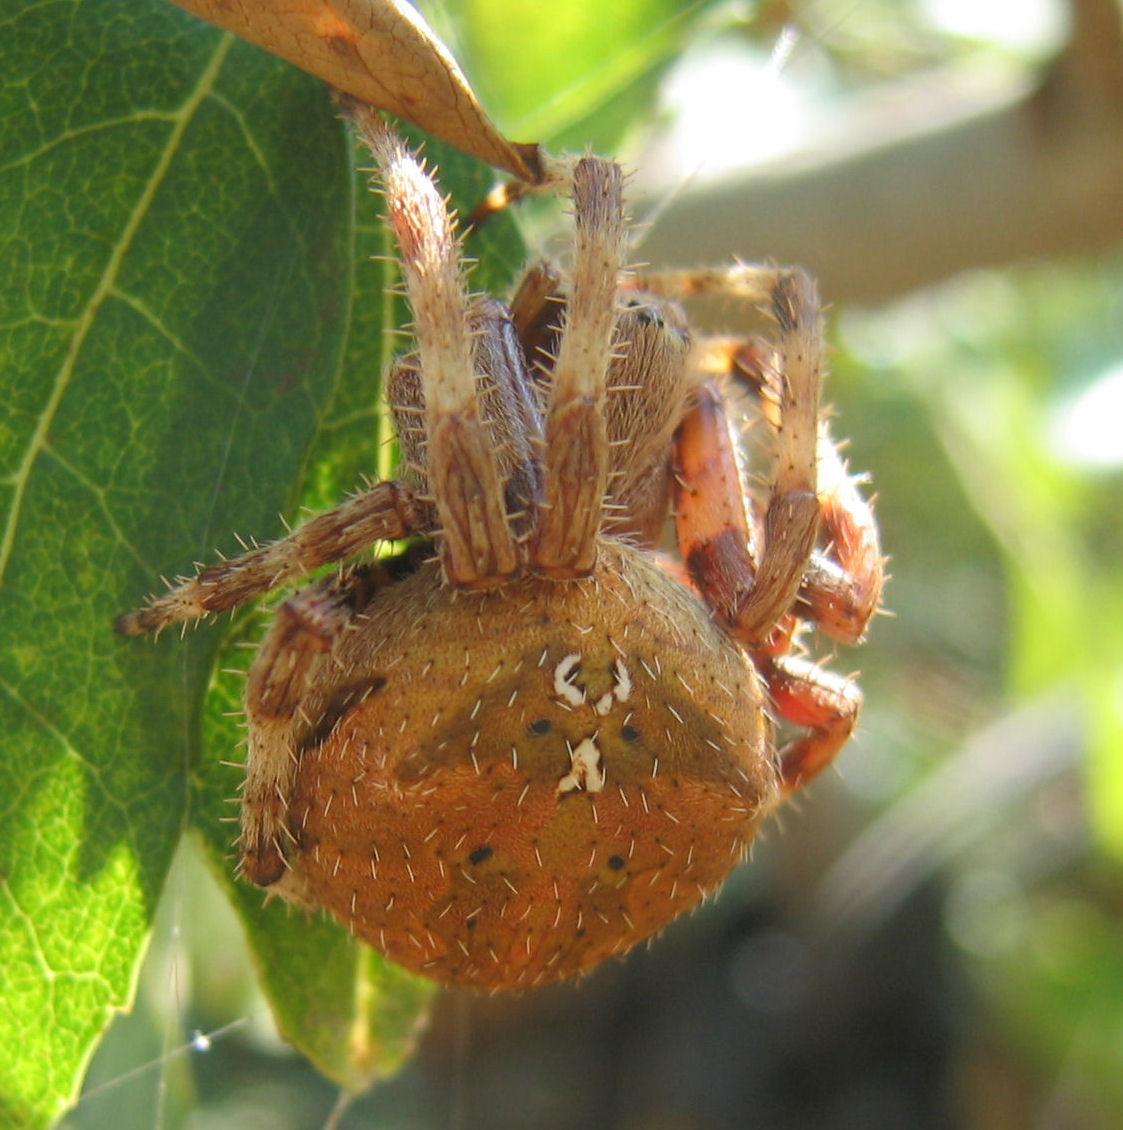 Araneus sp.